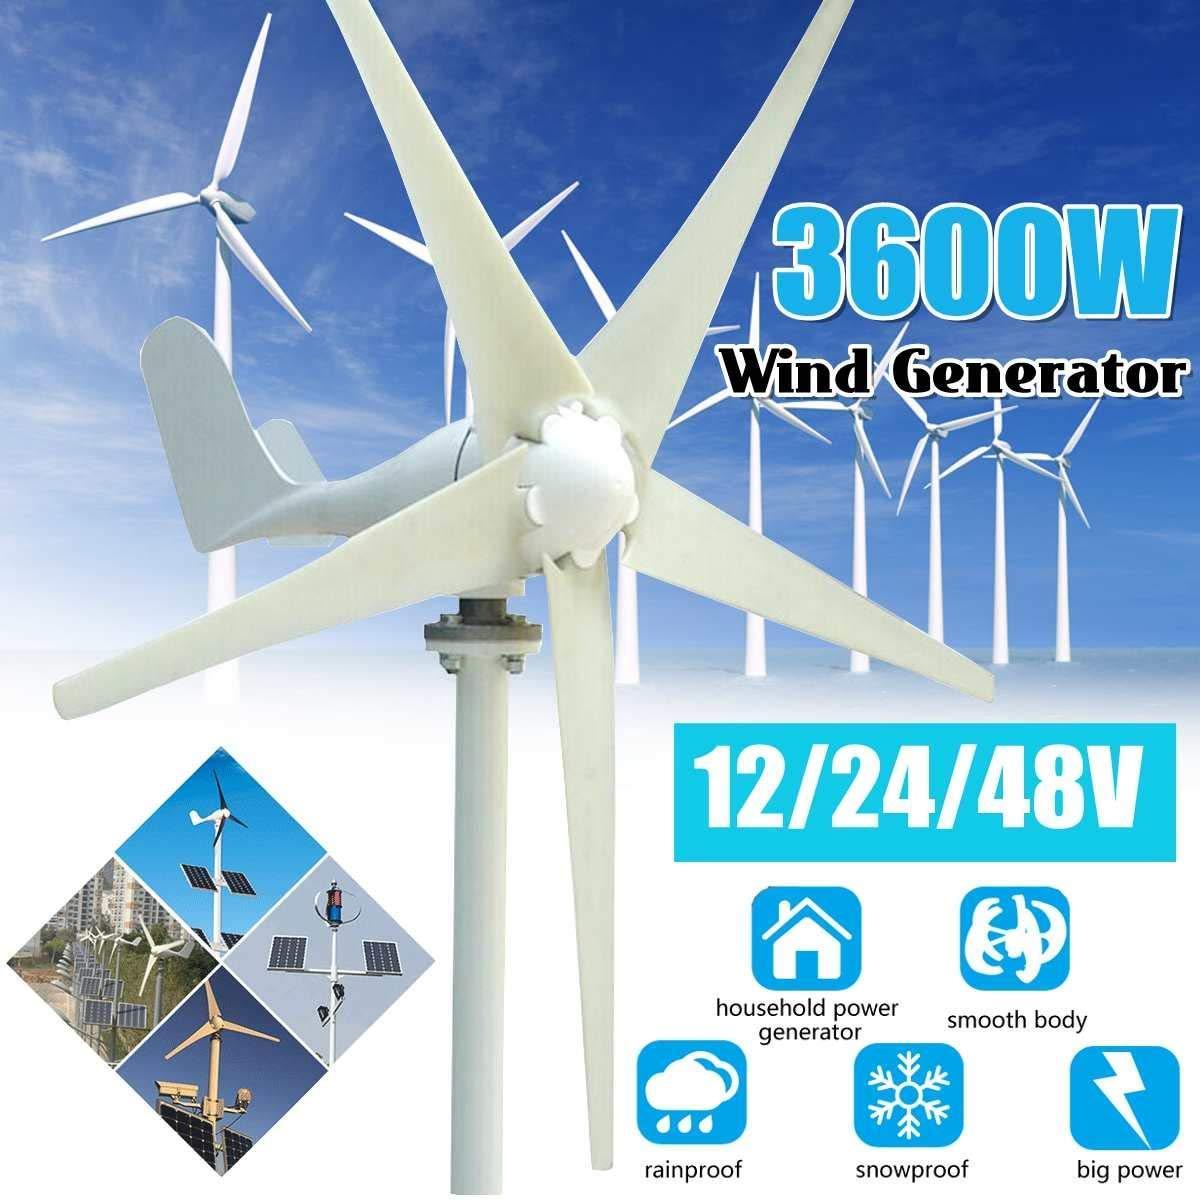 XIAOXIAO 3600W 12V / 24V / 48V + 6 aspas del Ventilador de turbina ...